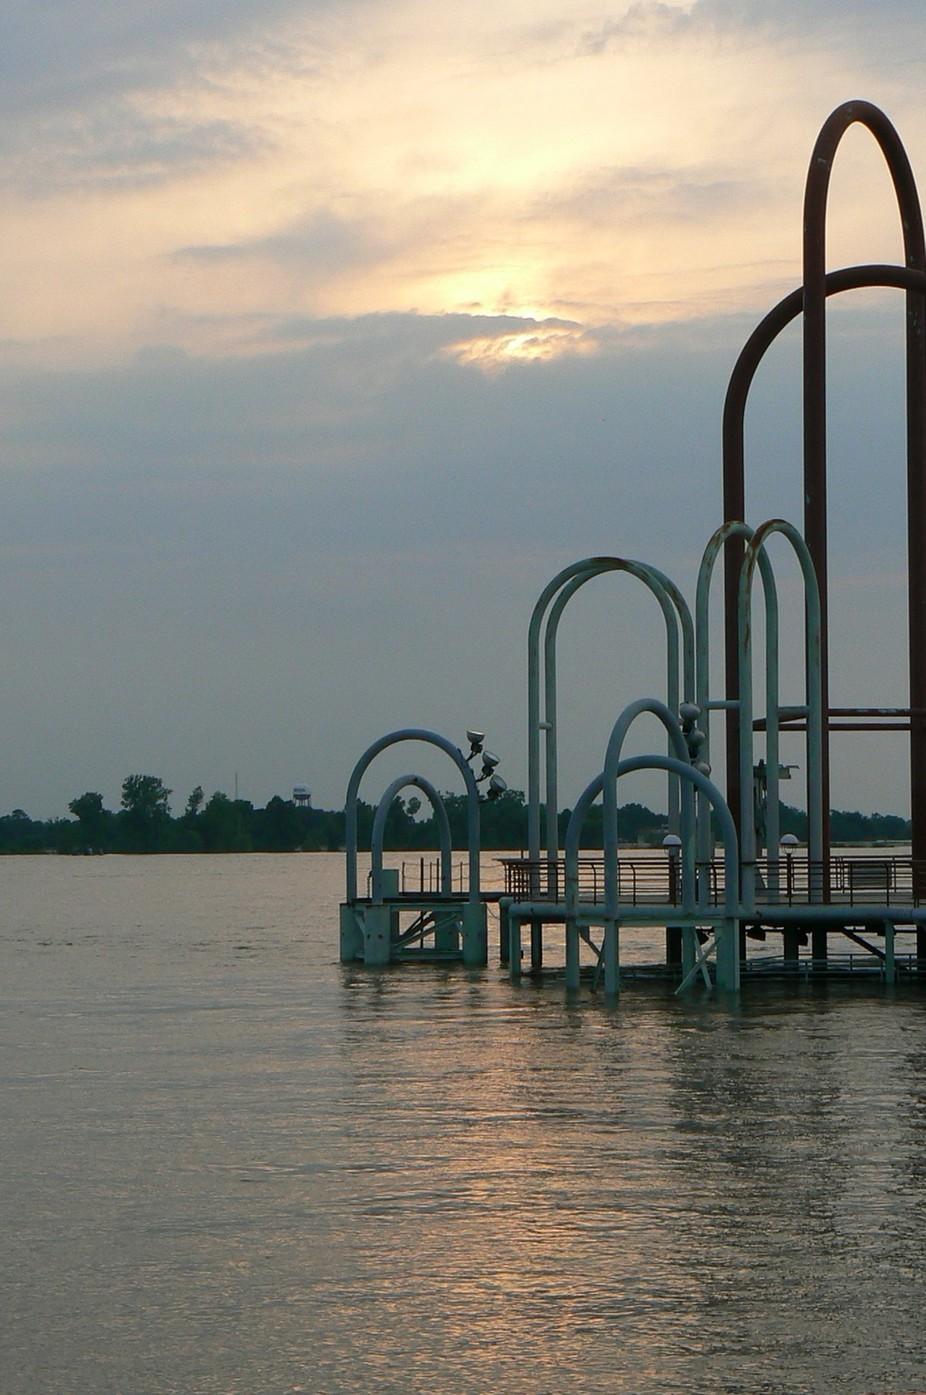 Mississippi River in Baton Rouge, LA